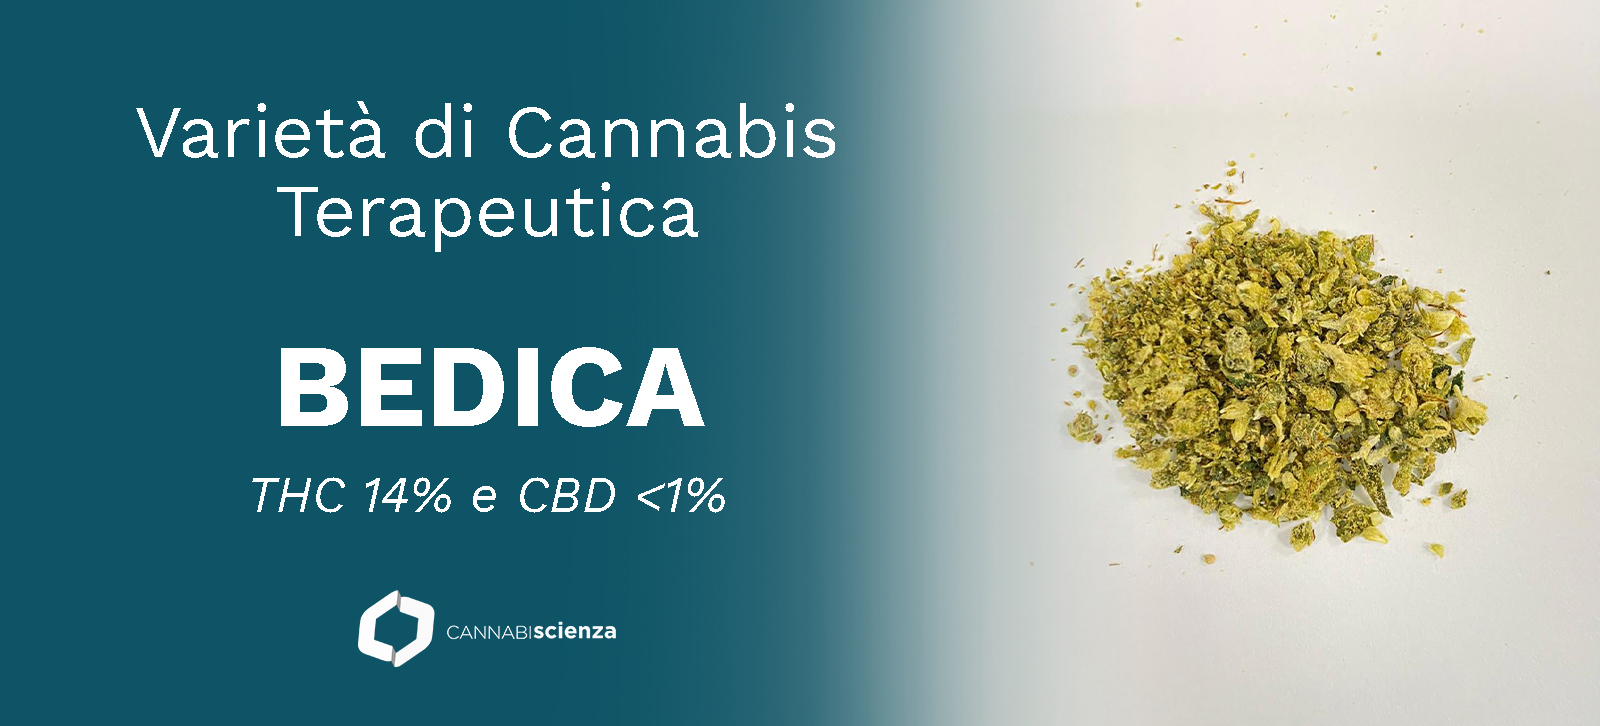 Bedica - Cannabis - terapeutica - Cannabiscienza